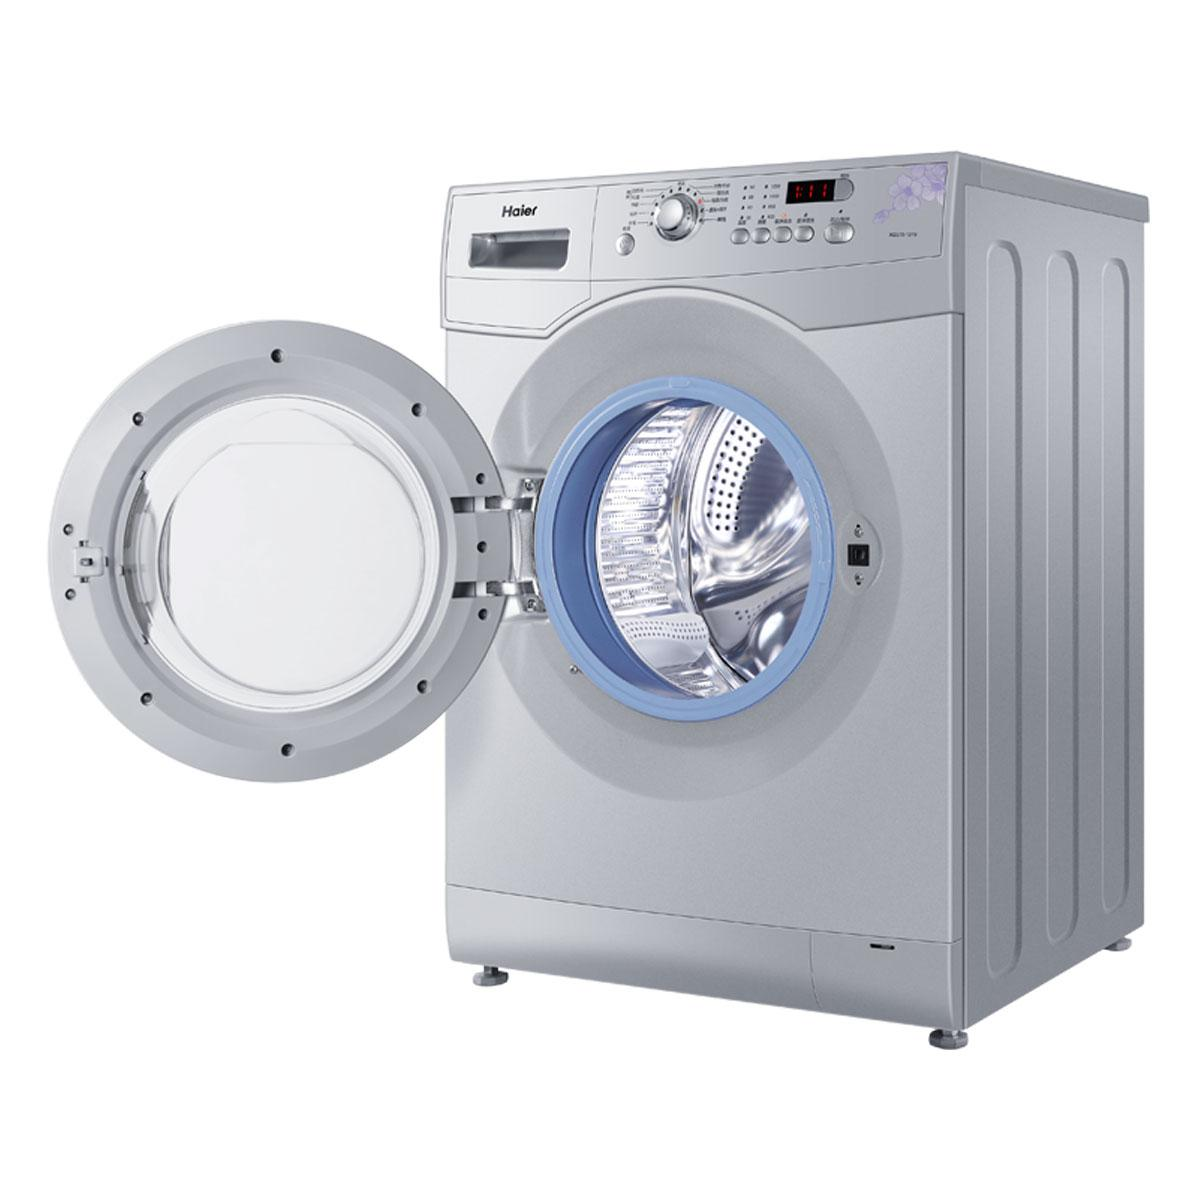 Haier/海尔                         滚筒洗衣机                         海尔 滚筒洗衣机 XQG70-1279